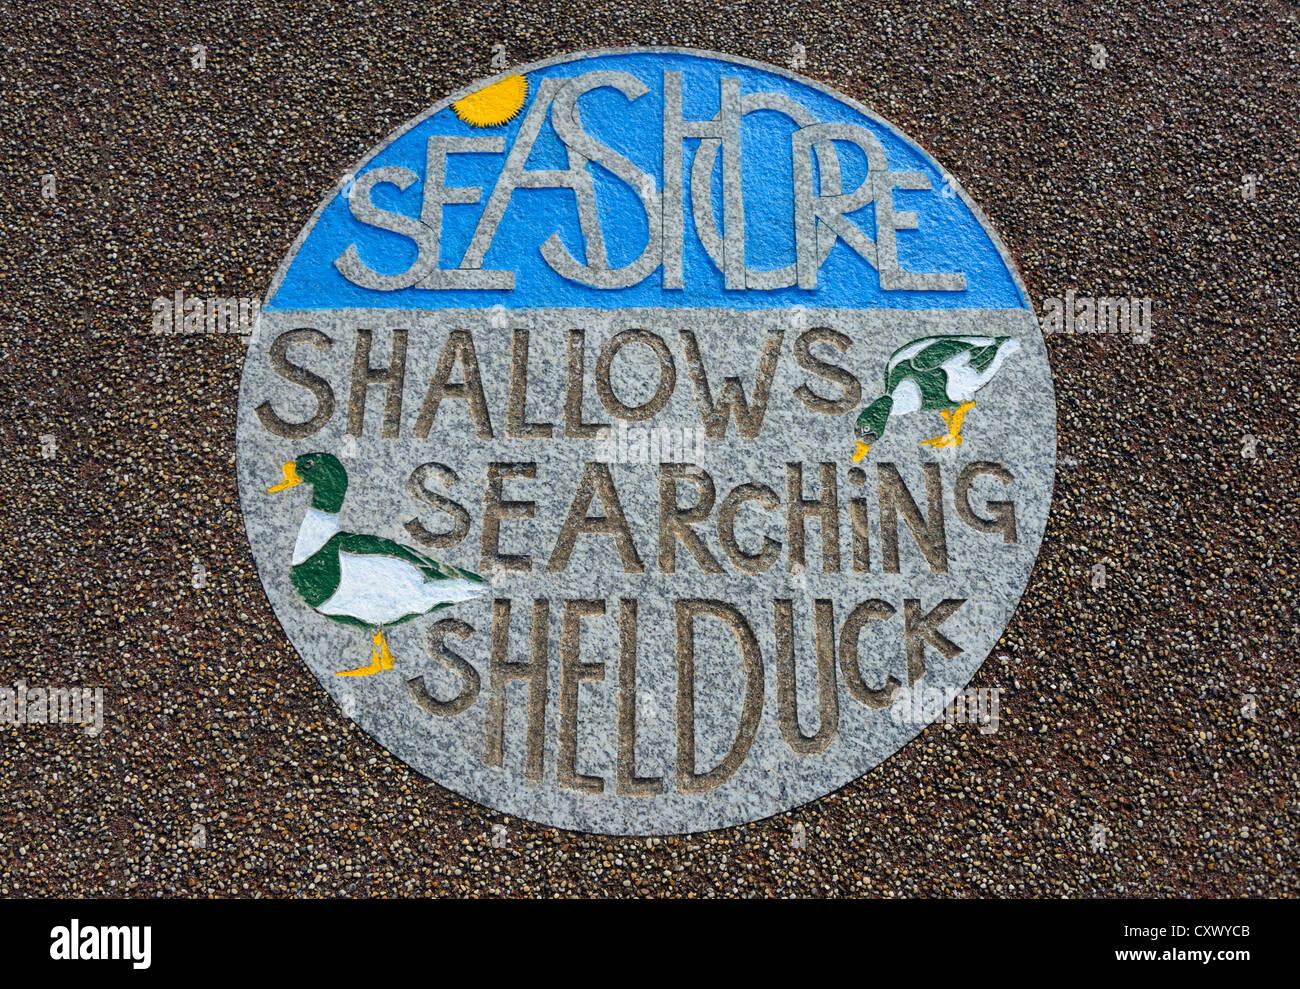 'SEASHORE SHALLOWS SEARCHING SHELDUCK'. The Tern Project, The Stone Jetty, Morecambe, Lancashire, England, - Stock Image